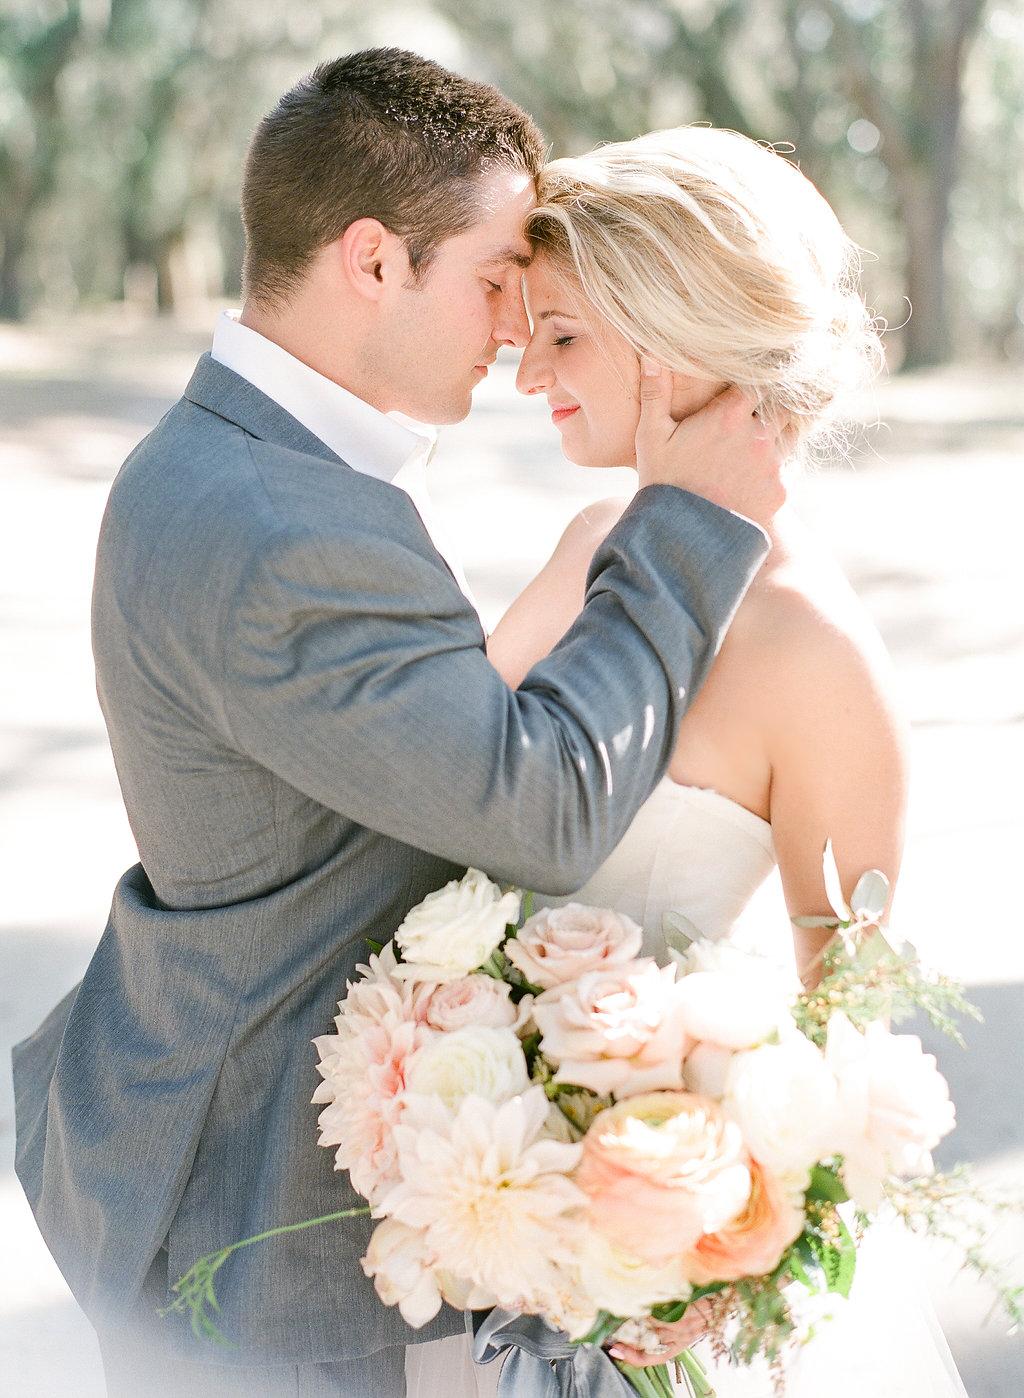 the-happy-bloom-wormsloe-wedding-savannah-wedding-ivory-and-beau-bridal-boutique-savannah-wedding-dresses-savannah-bridal-boutique-georgia-bridal-boutique-design-studio-south-sunset-wedding-blush-by-hayley-paige-candi-1550-blush-wedding-dress-2.jpg